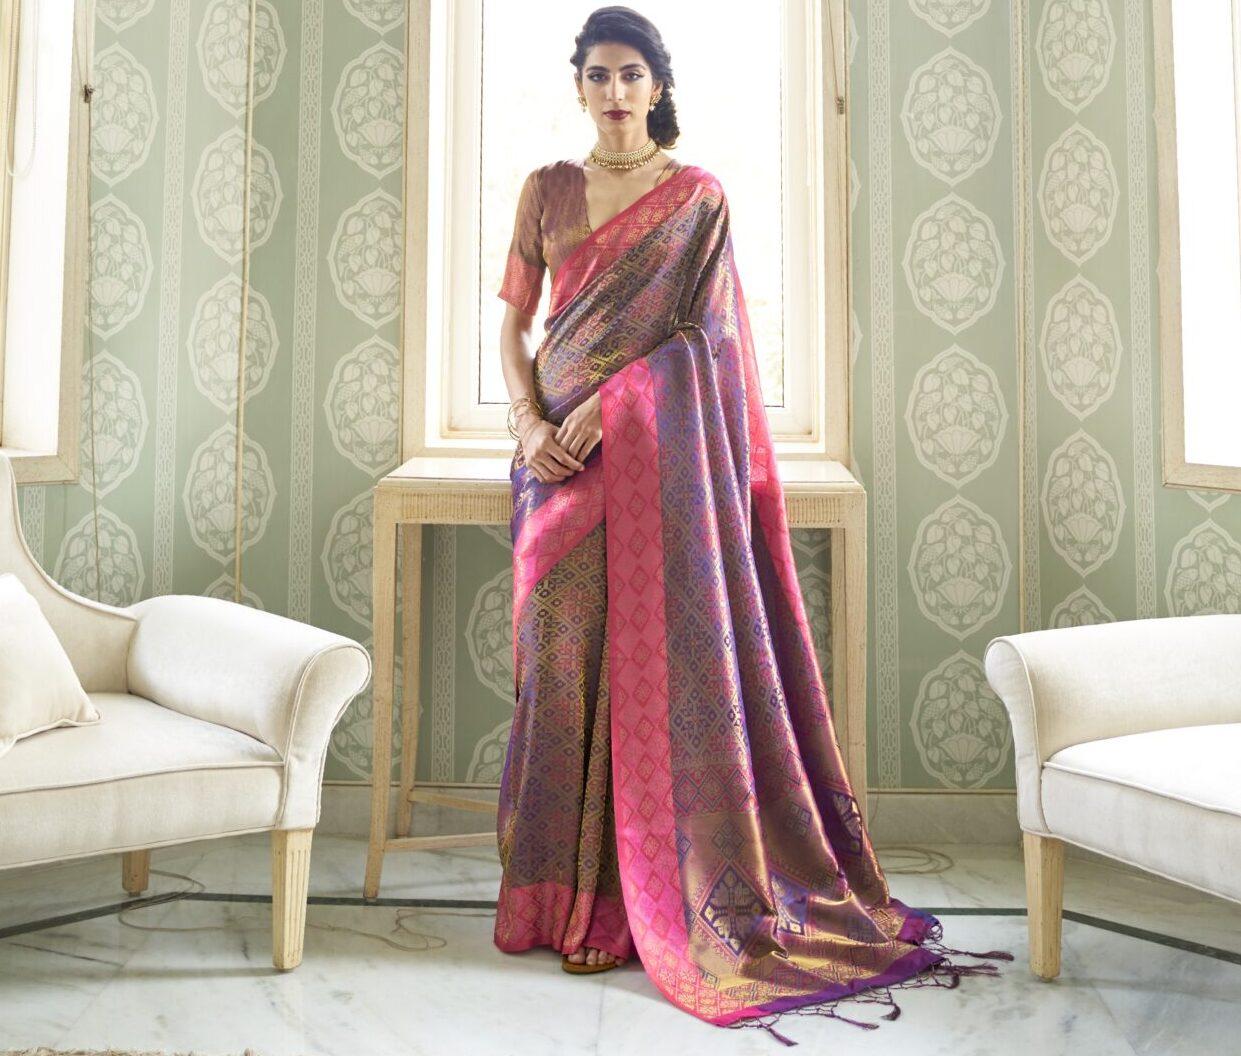 Best Embroidery Work Multicolor Silk Saree Simple Classy Blouse Design